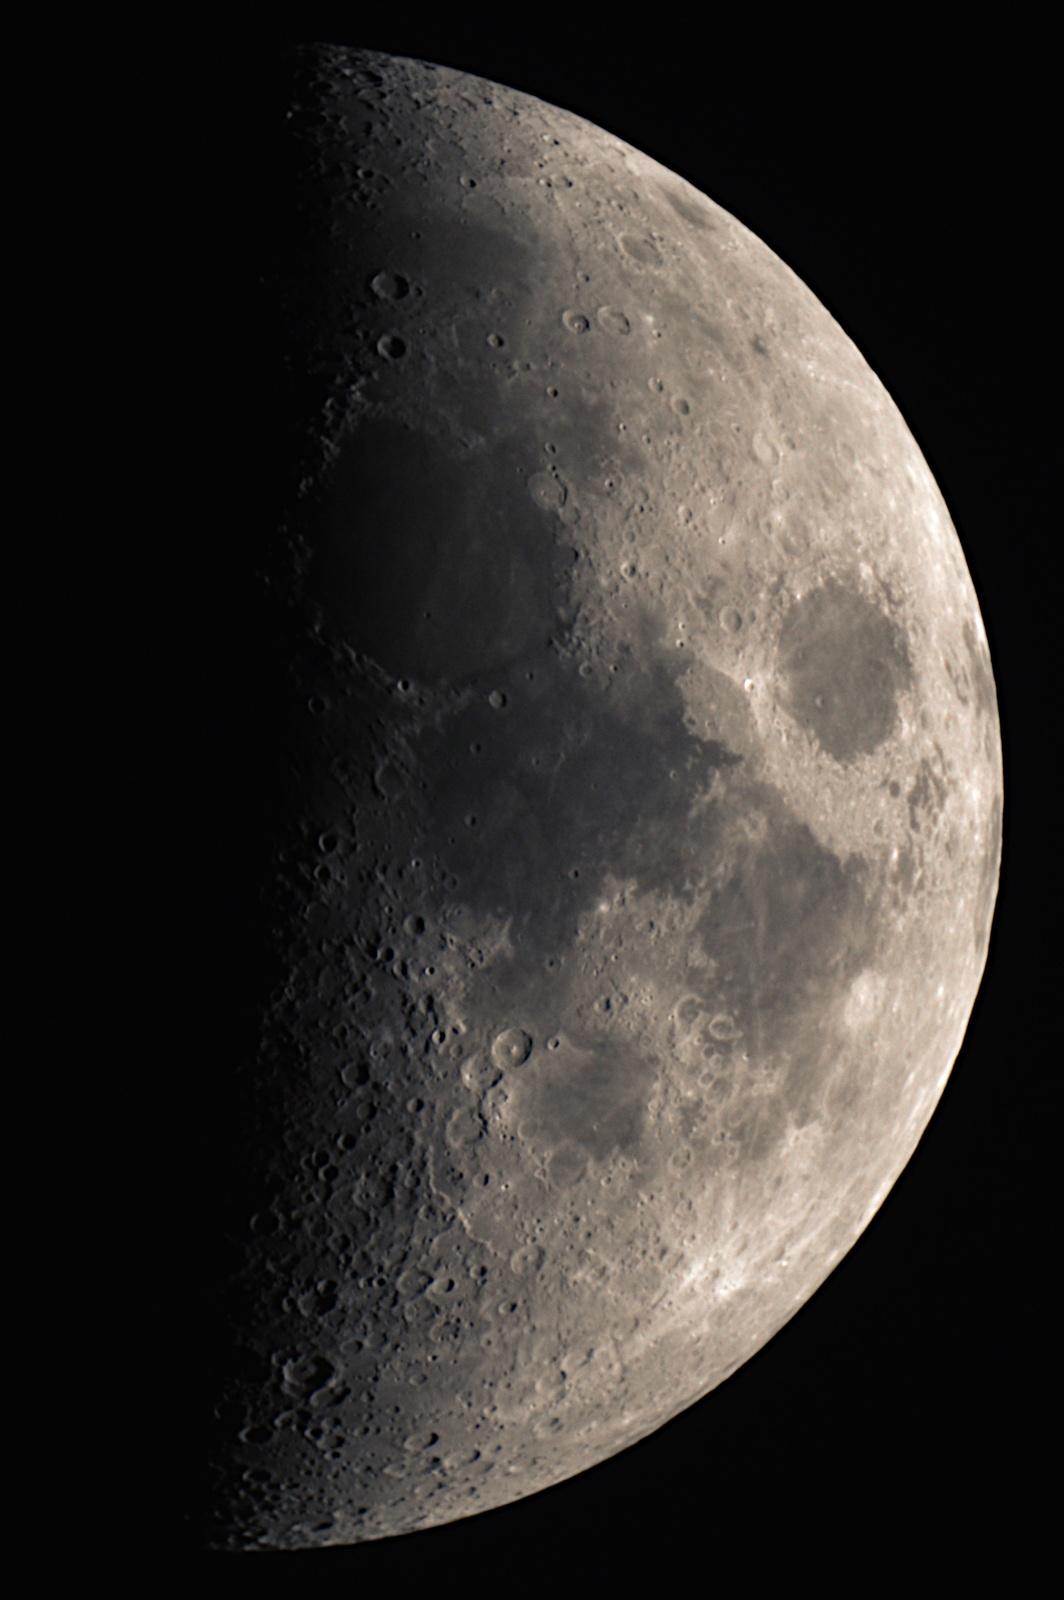 Moon_20201221.thumb.jpg.91094630b376af116a50c698b3b5d7f7.jpg